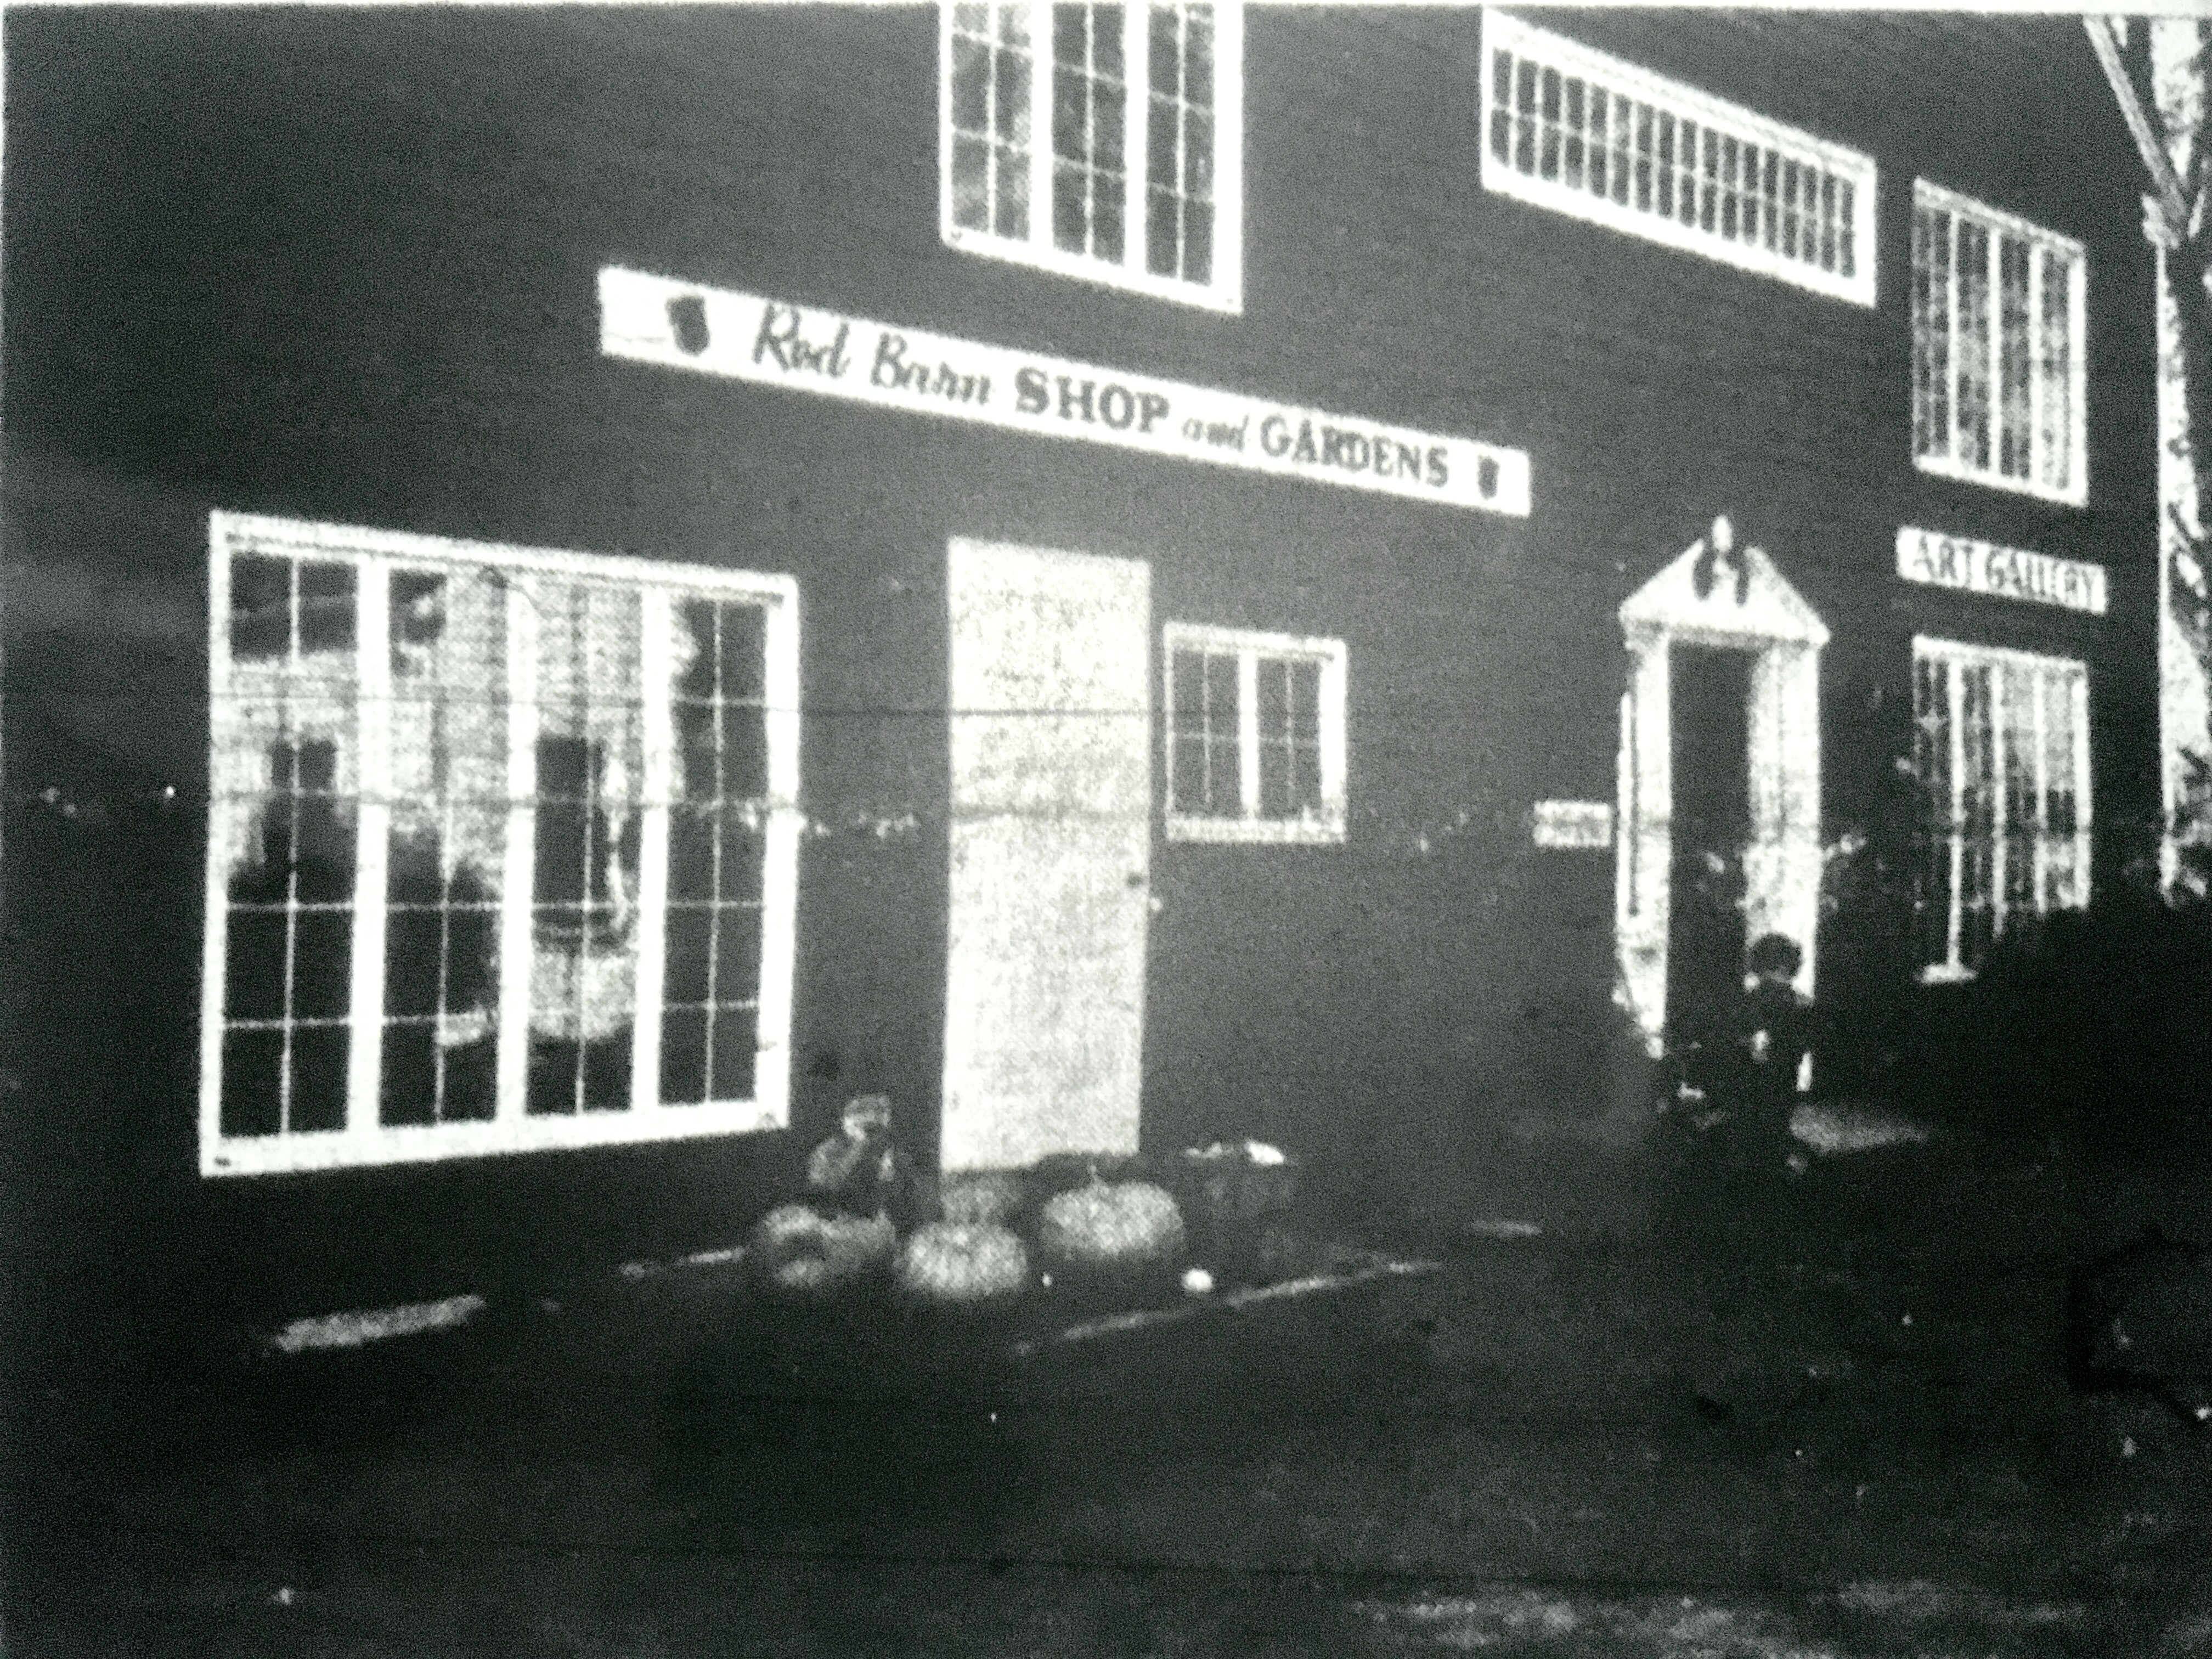 Red barn shop, Burlington MA